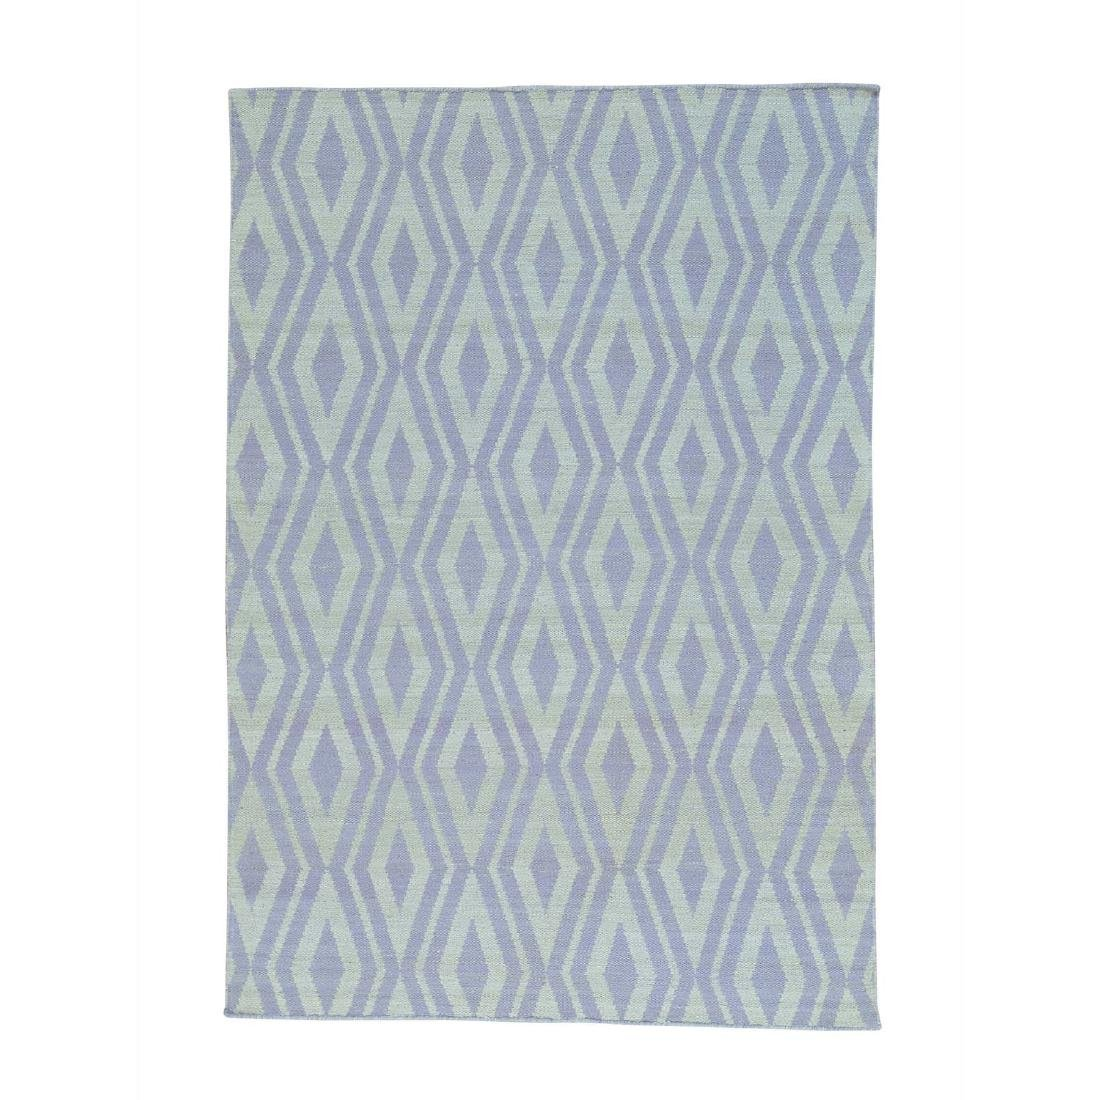 Ivory Flat Weave Hand Woven Reversible Kilim Rug